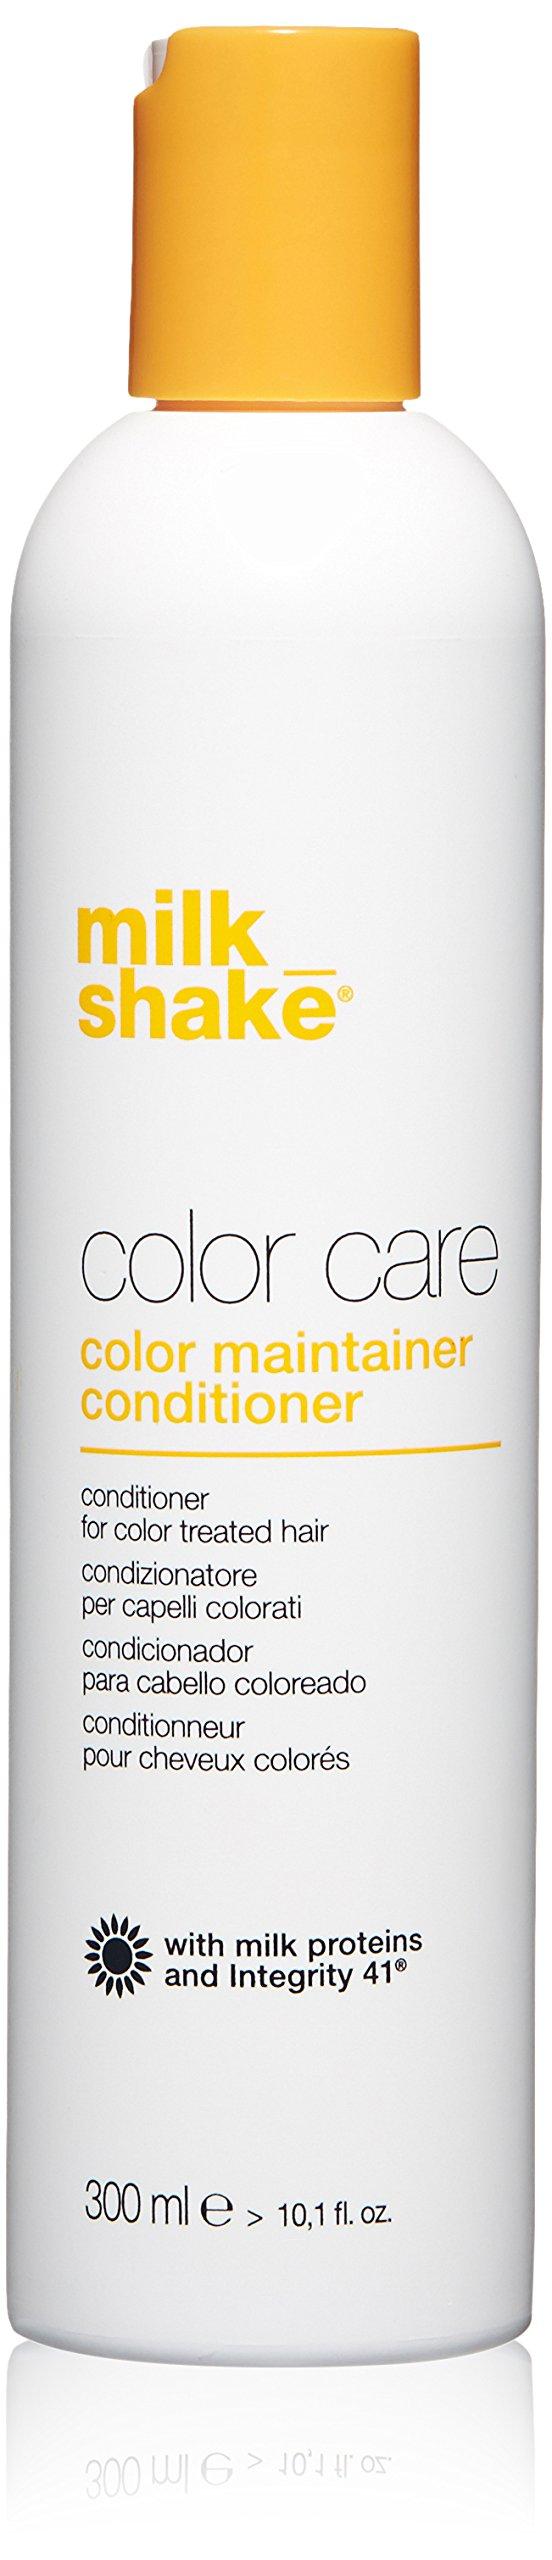 milk_shake Color Maintainer Conditioner